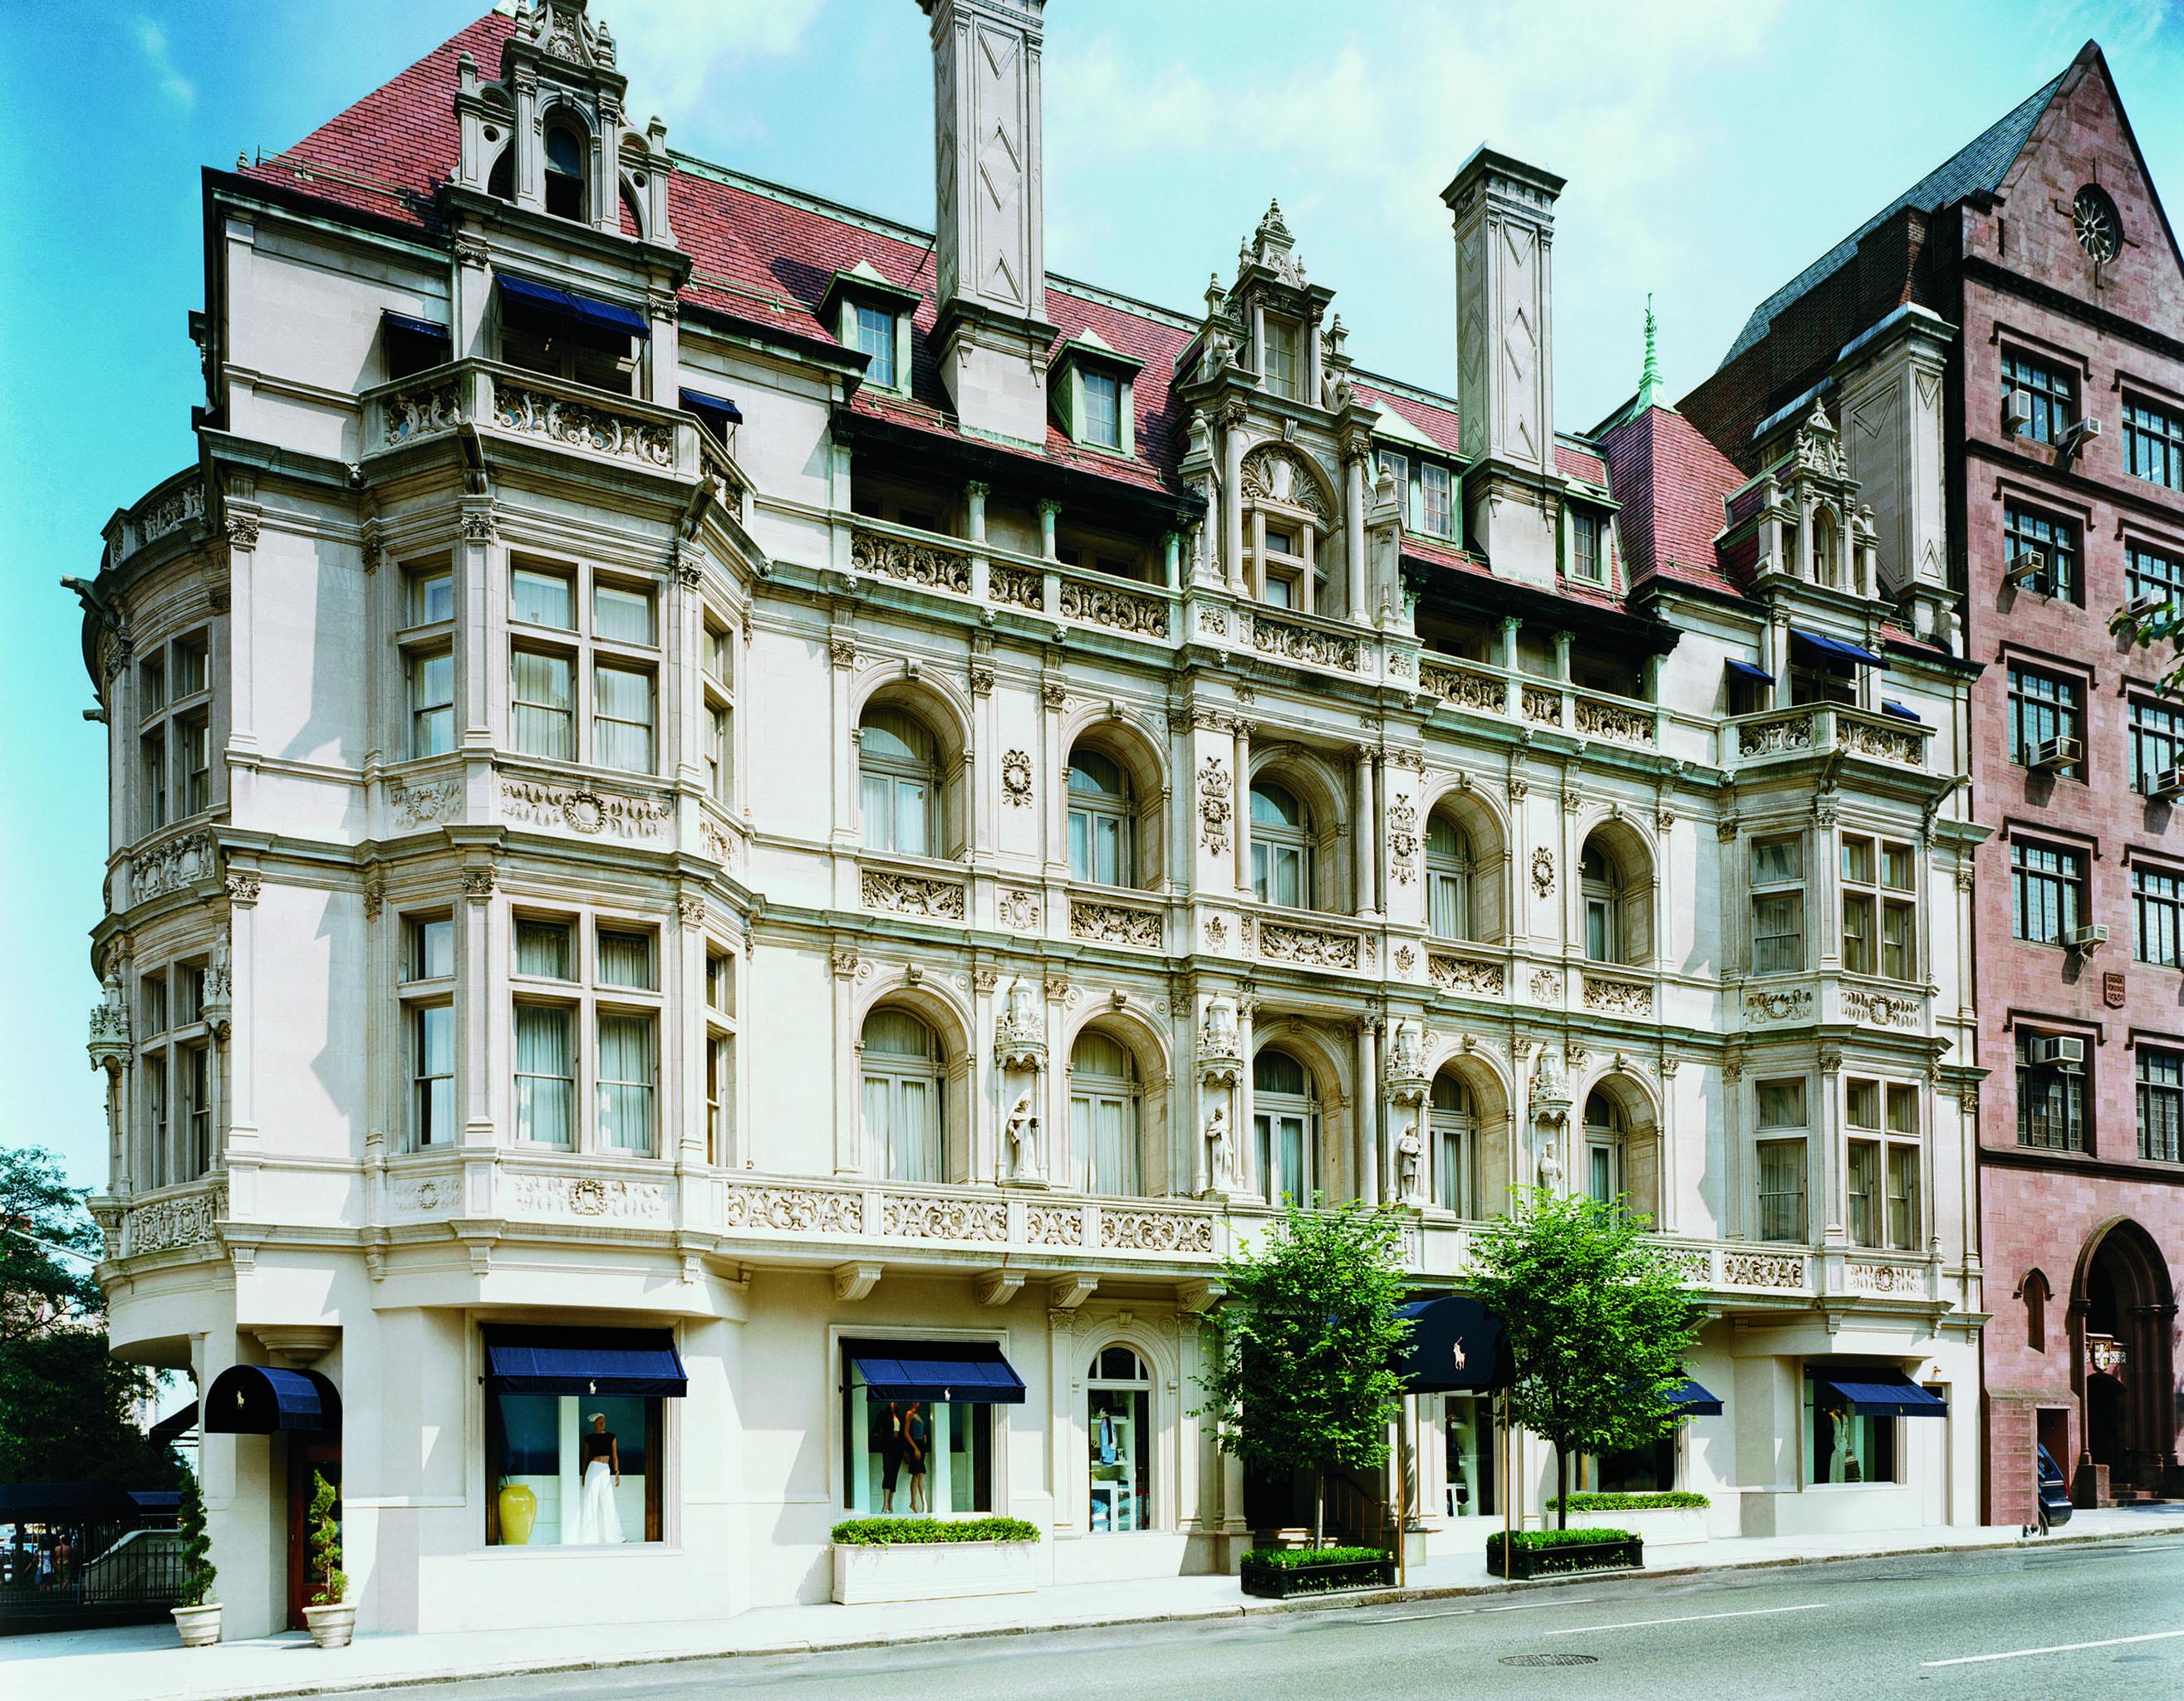 The Rhinelander Mansion houses Lauren's flagship.